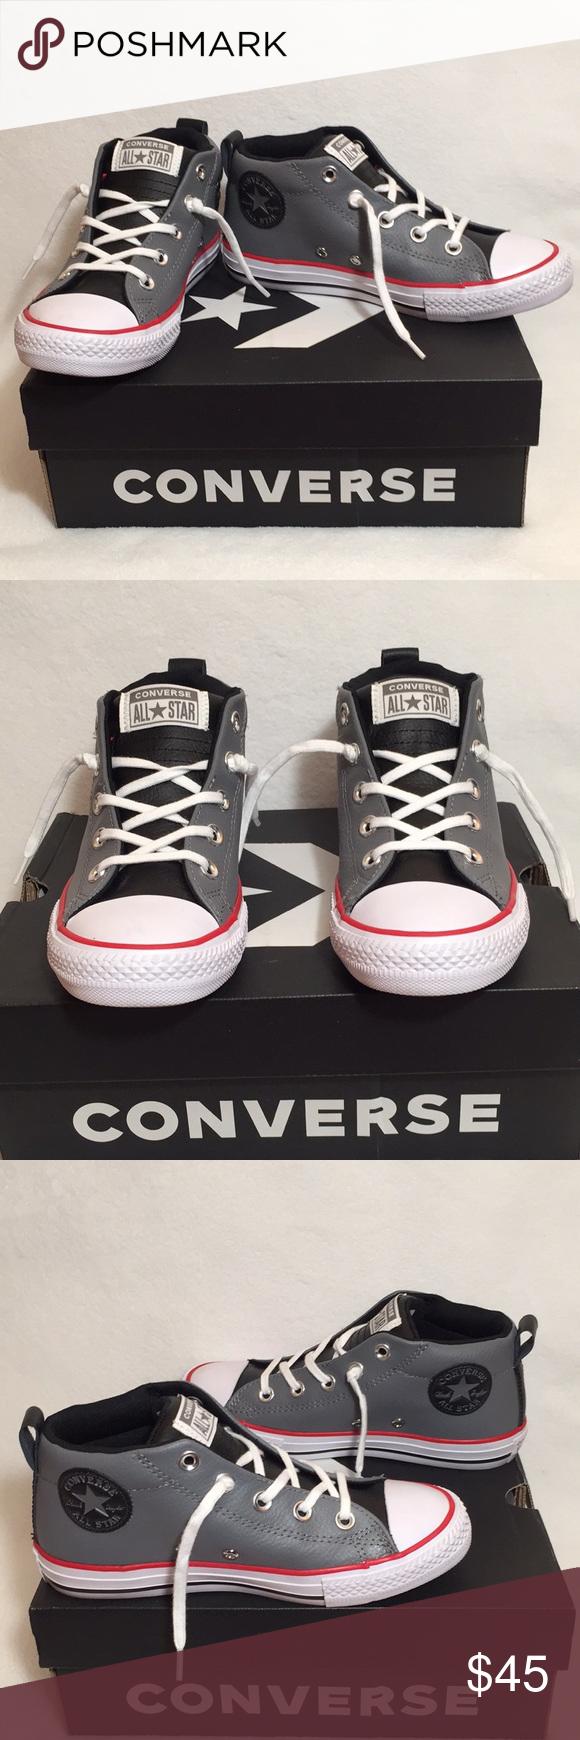 82b6b8684c89 NIB Converse Chuck Taylor All Star Juniors Size 2 Converse New In Box  Leather Chuck Taylor